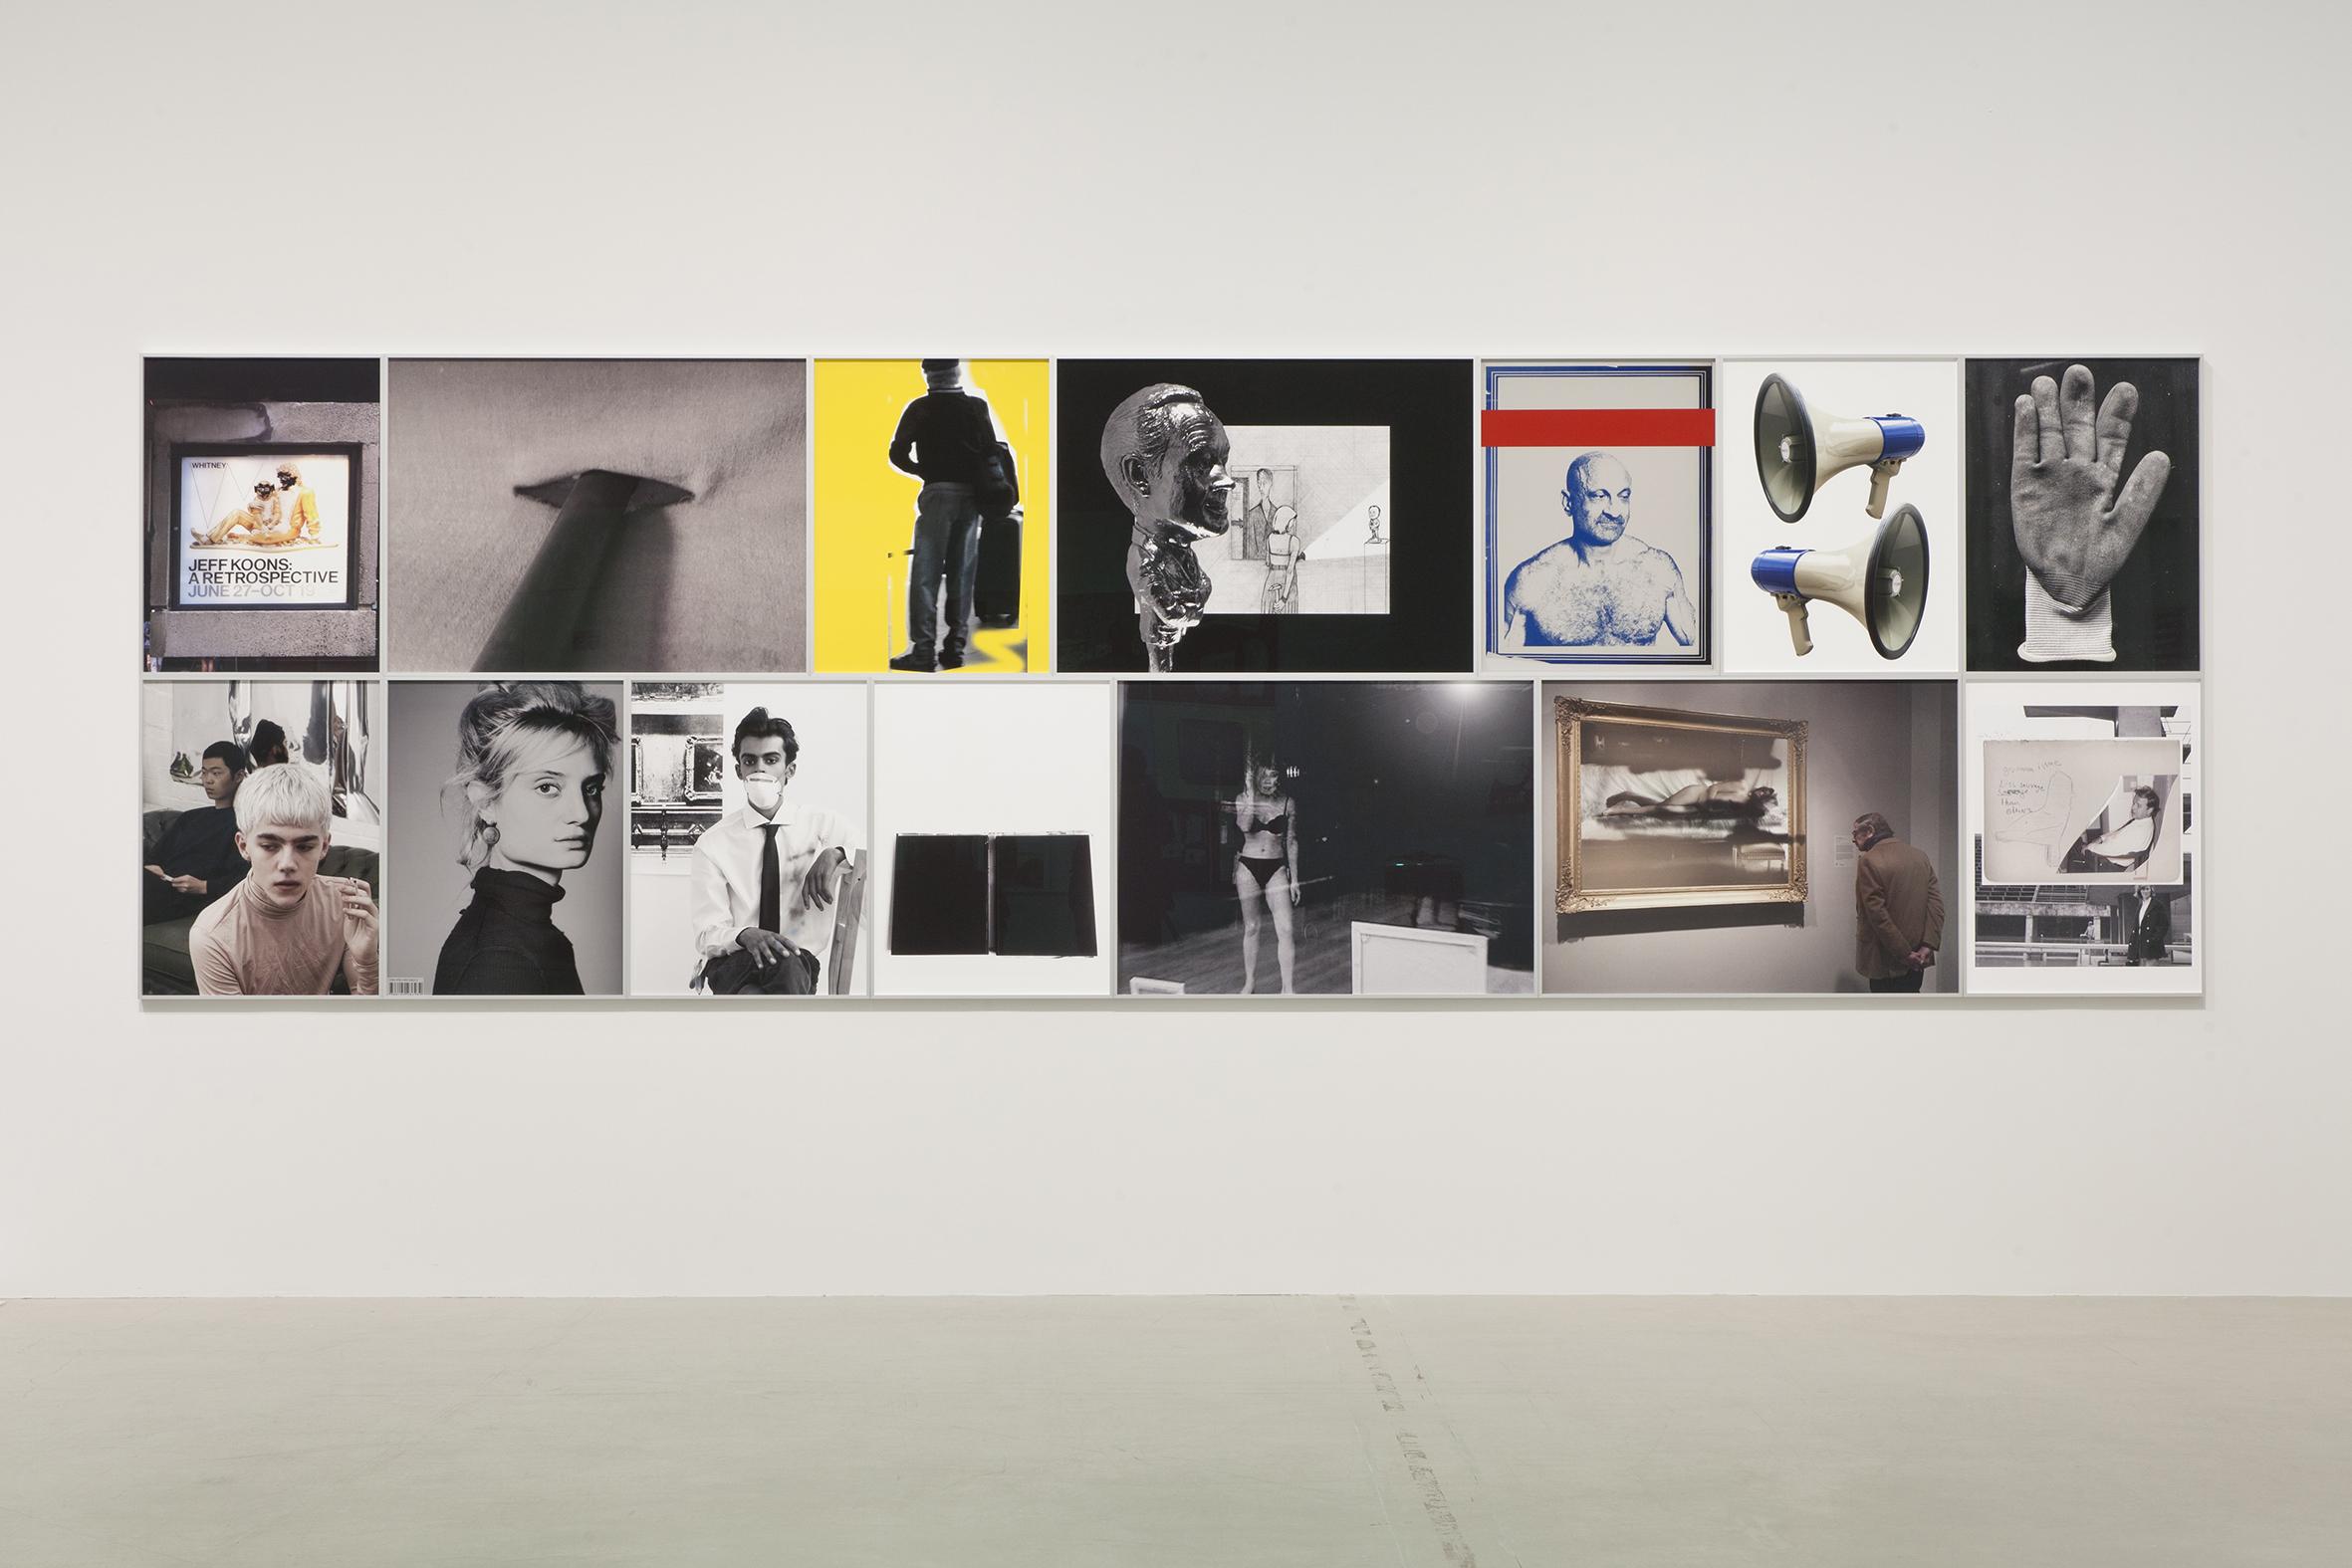 Rosemarie Trockel is showing at the Moderna Museet until 3 March